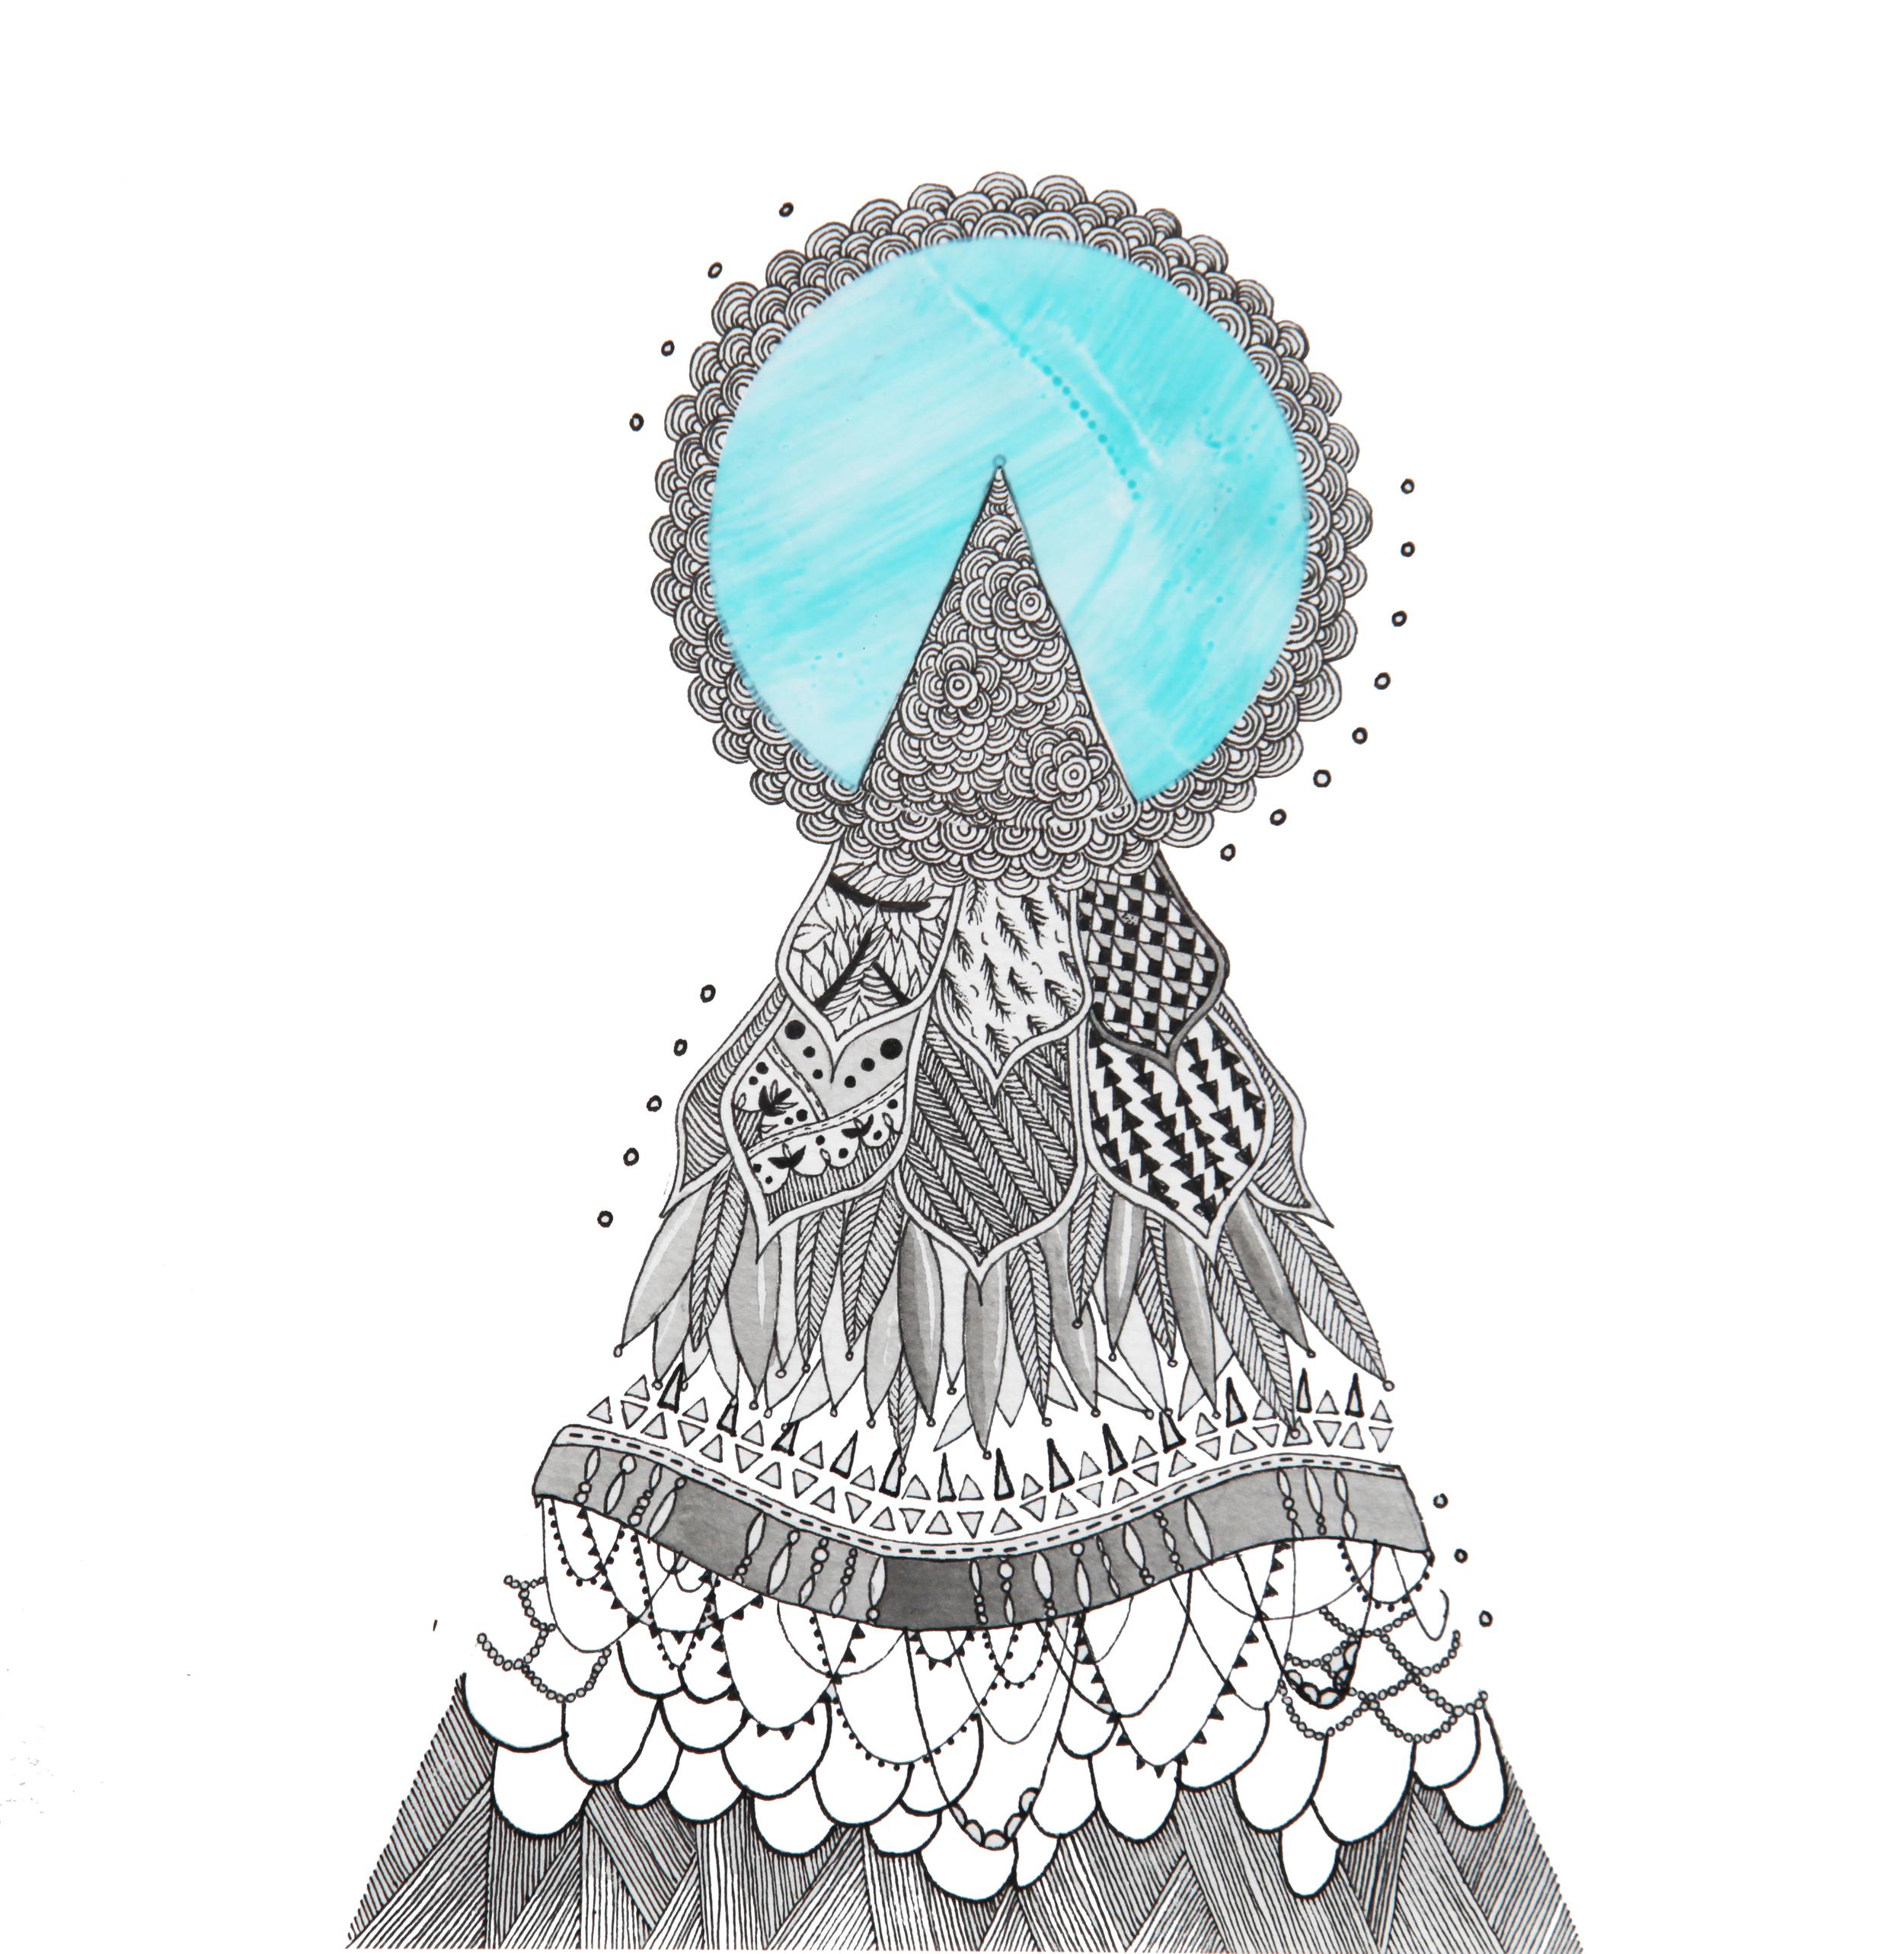 Mount Shinyfeather